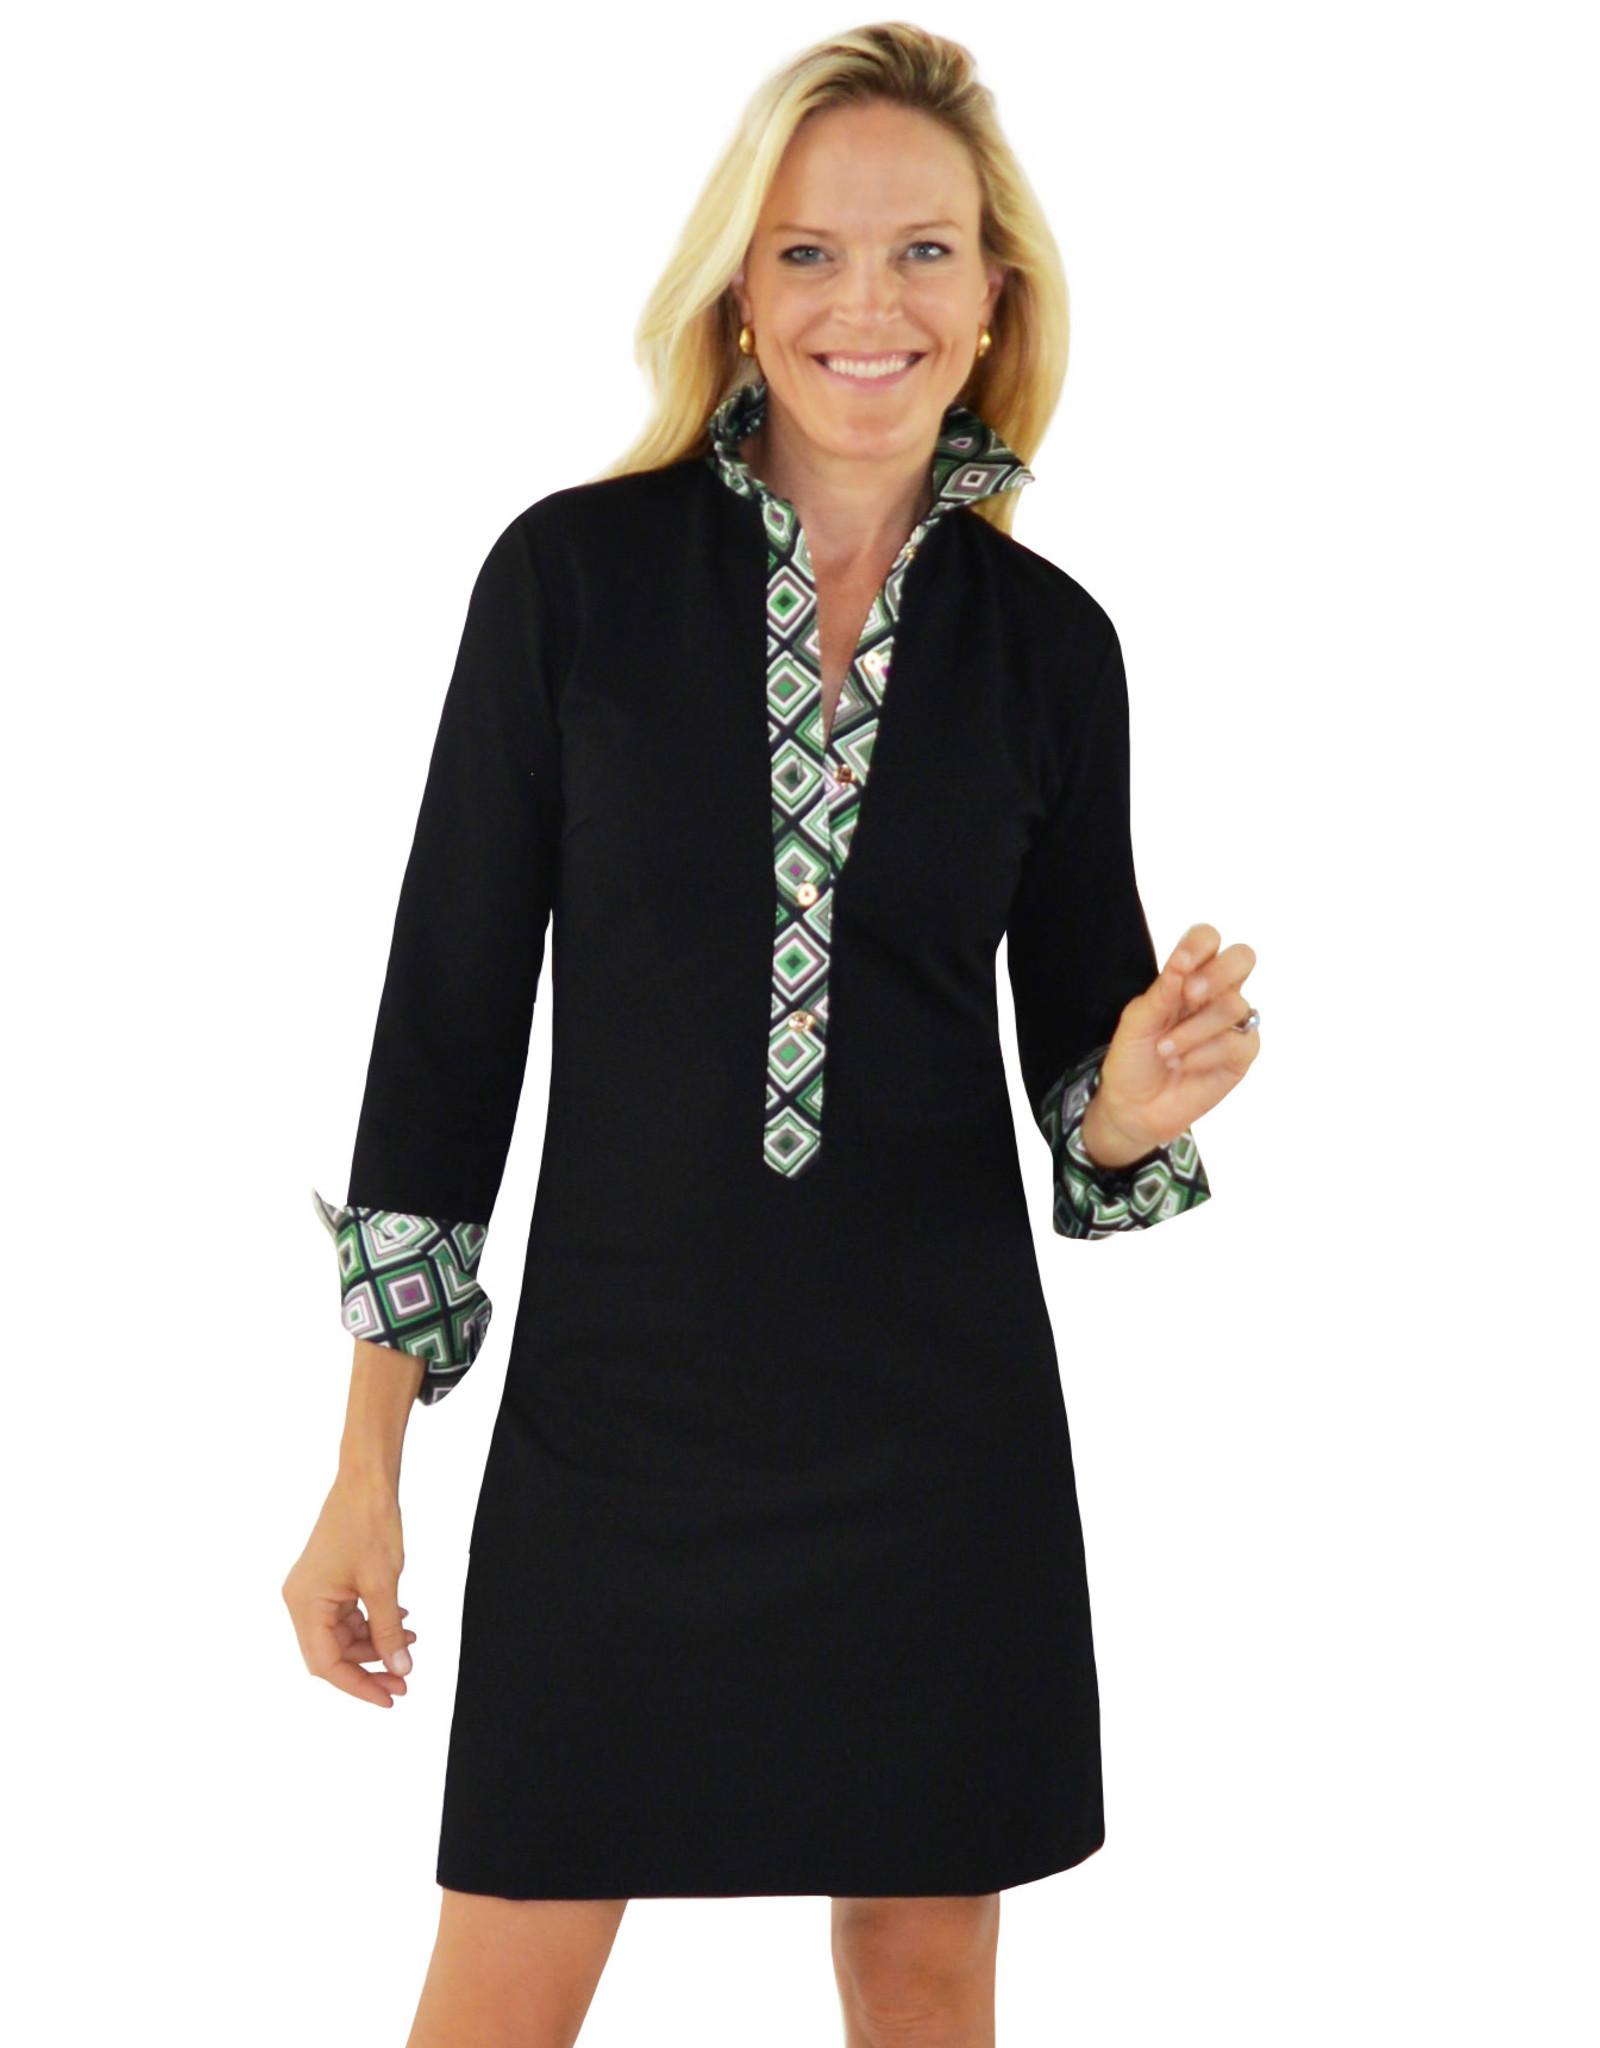 Ivy Dress Black/Green